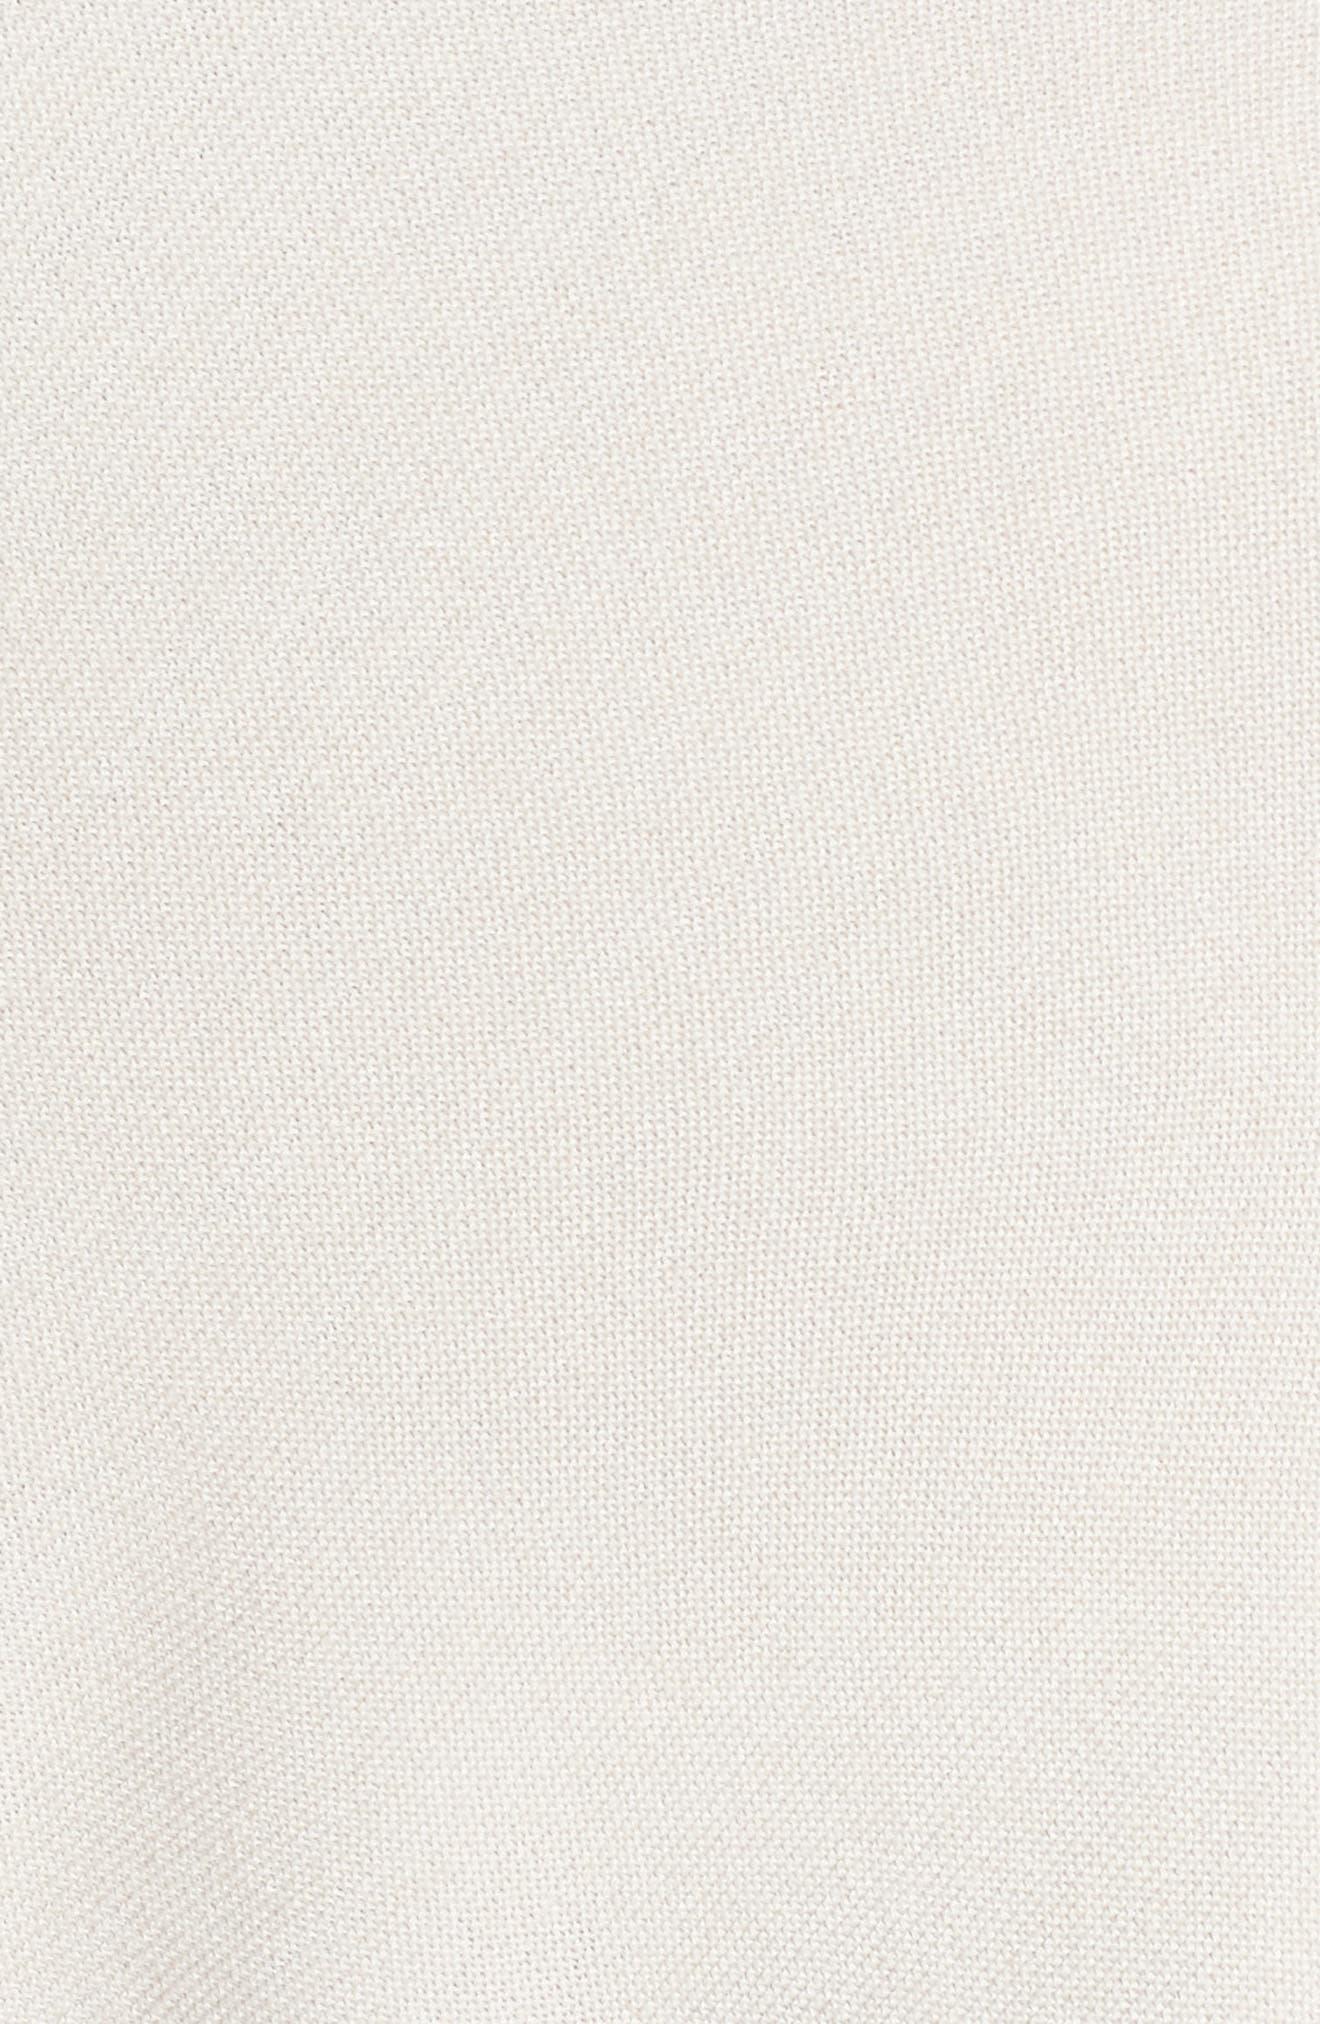 Wool Blend Knit Vest,                             Alternate thumbnail 5, color,                             Light Grey